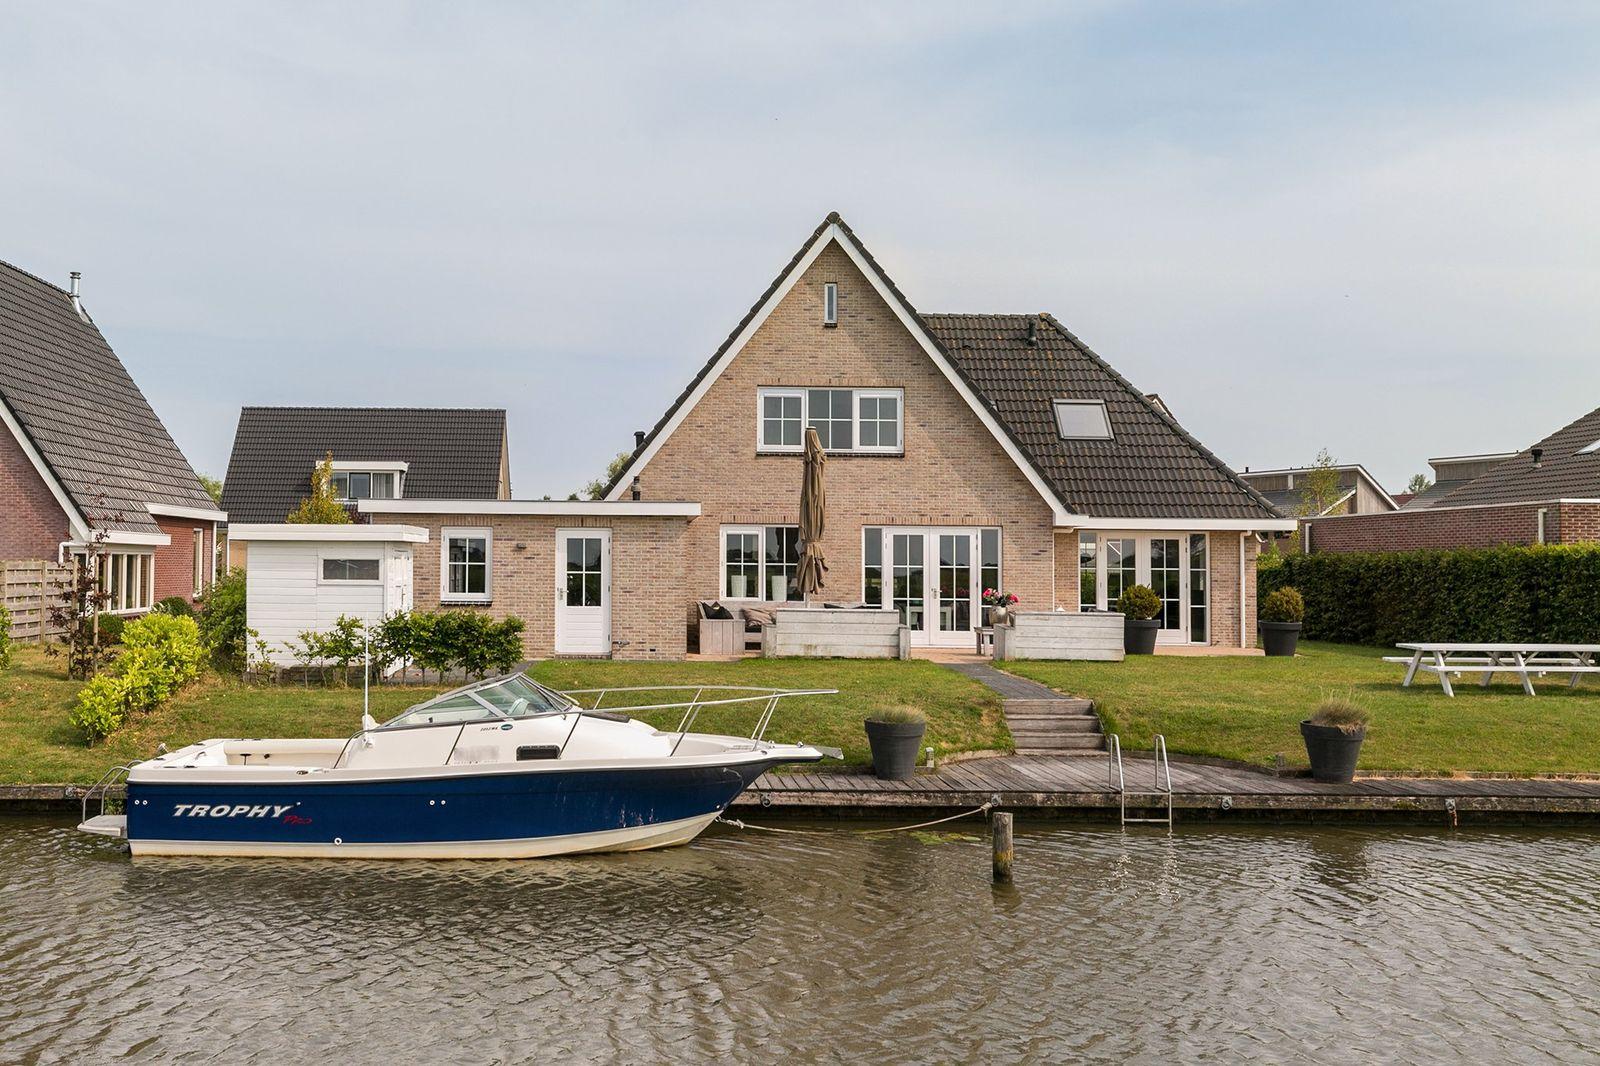 It Heechhout 16, Winsum